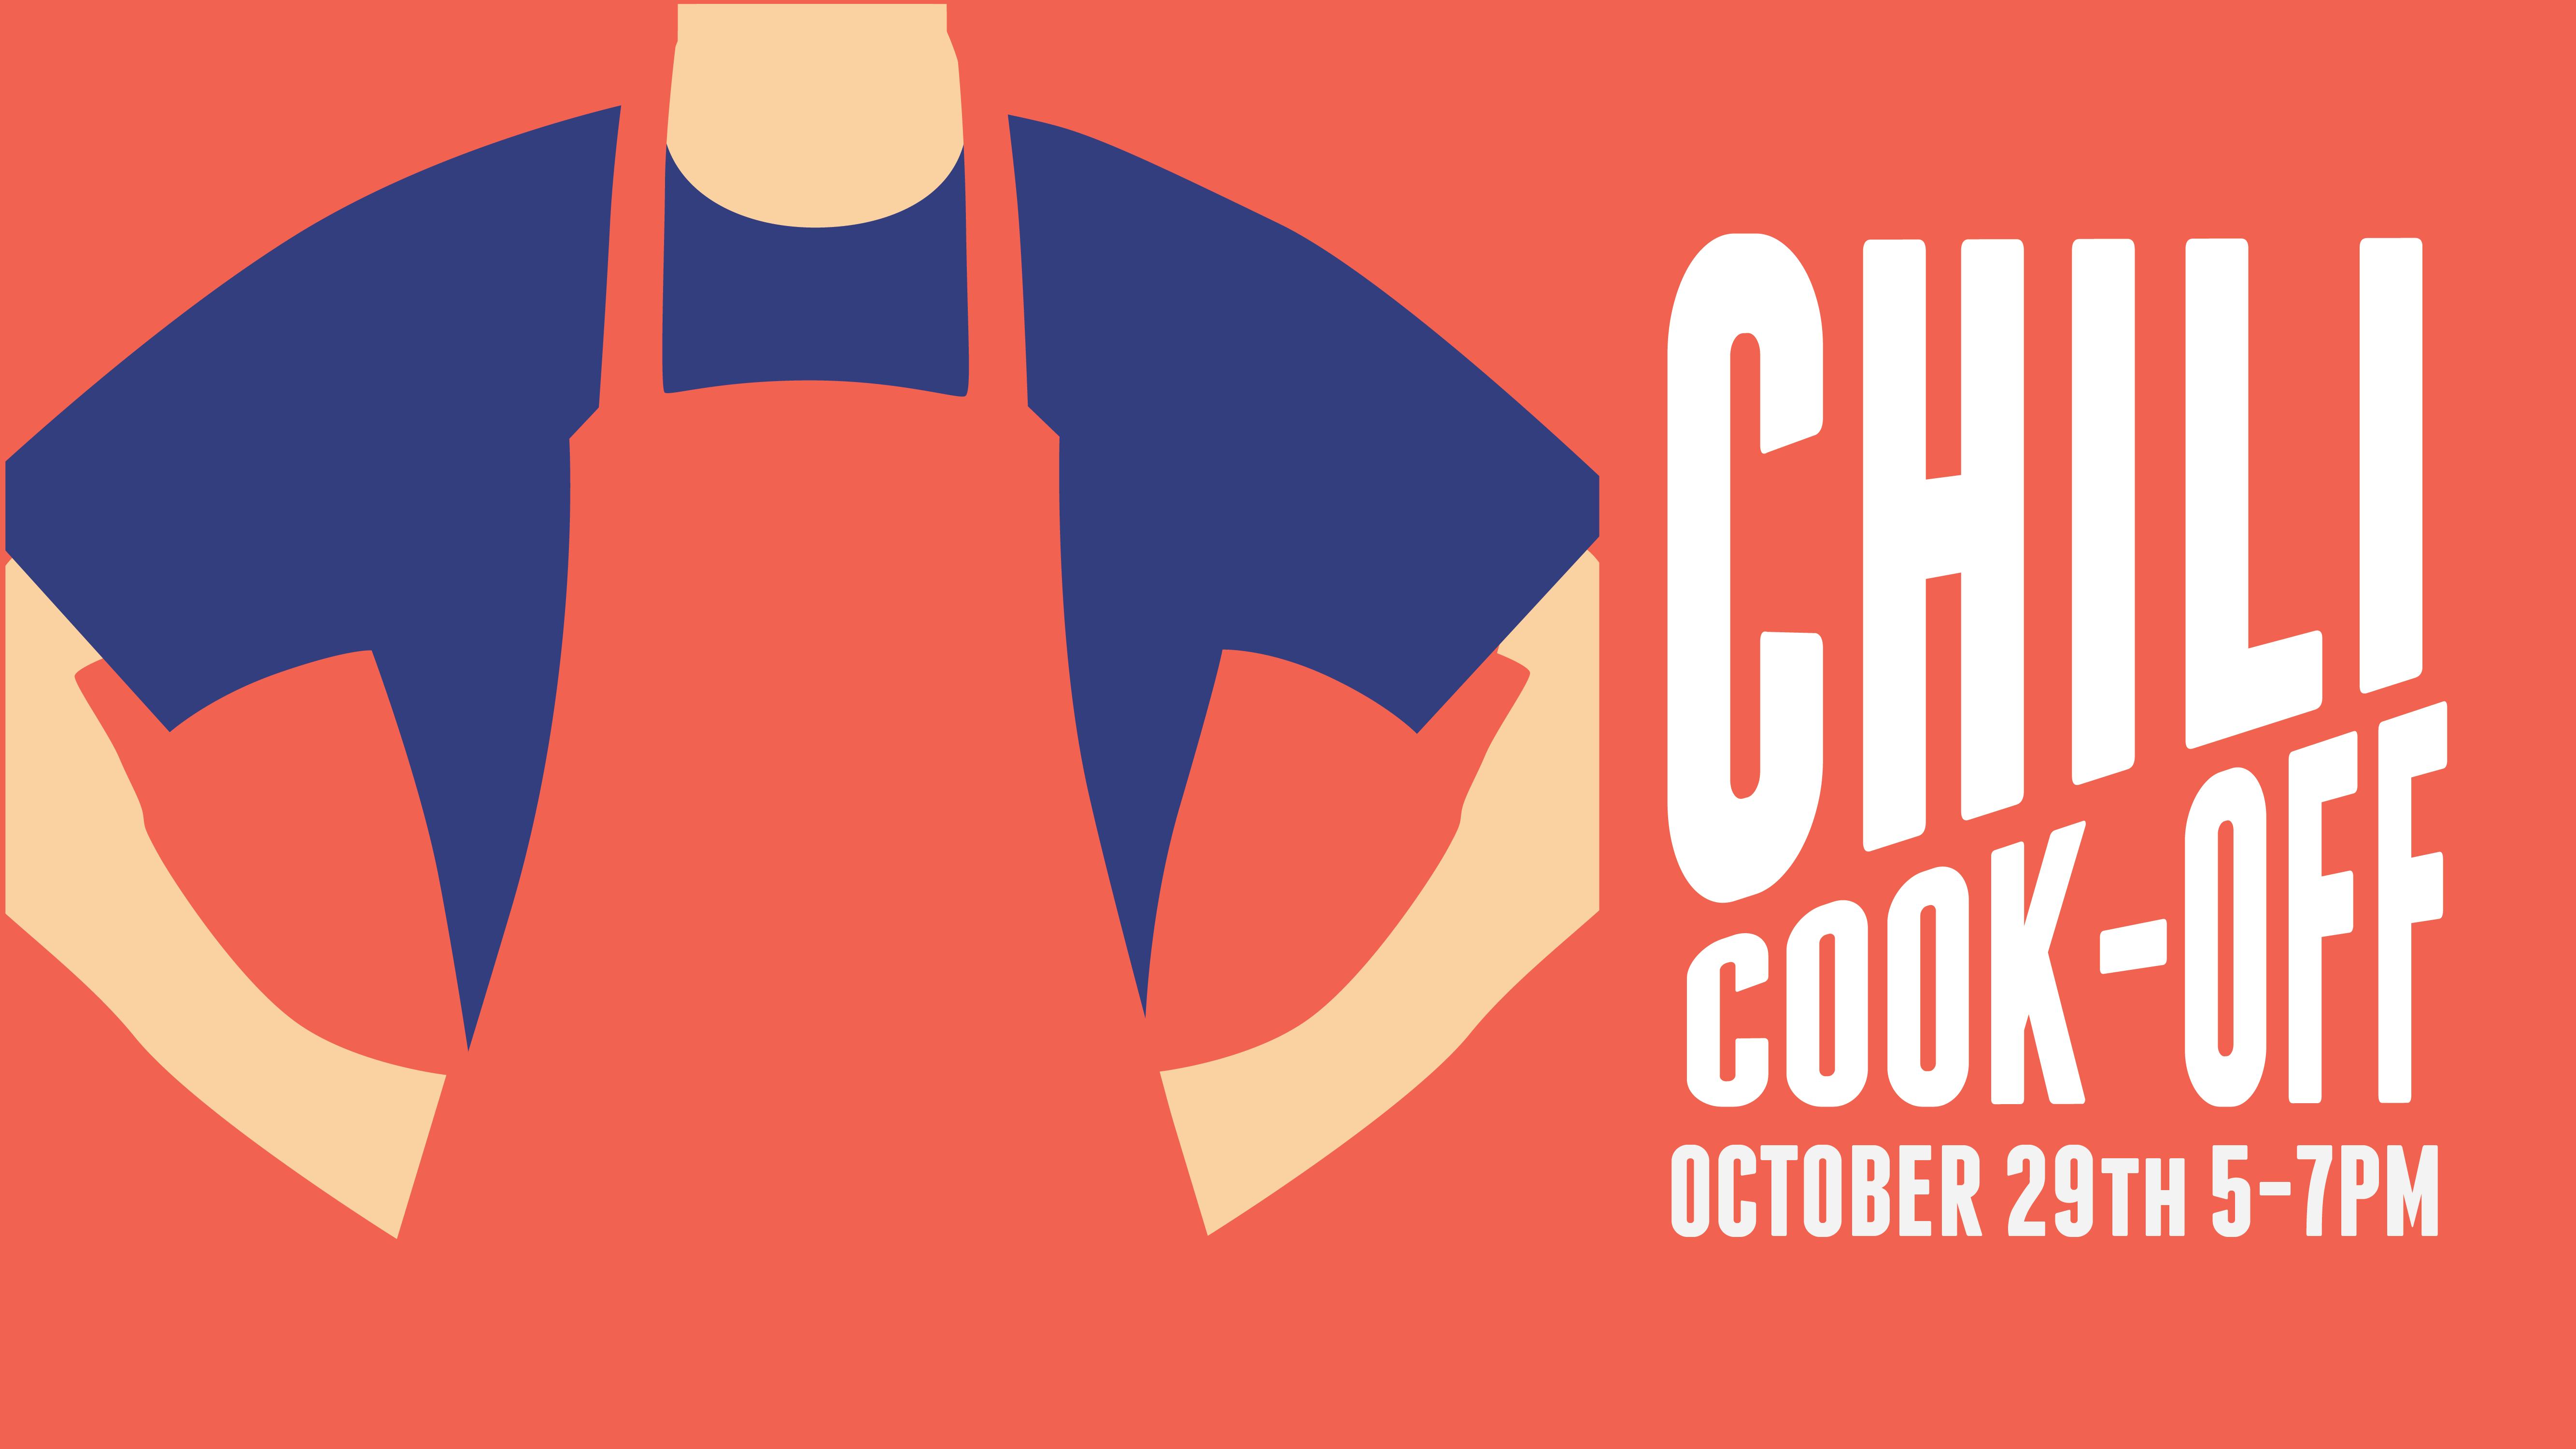 Chili cook off 01